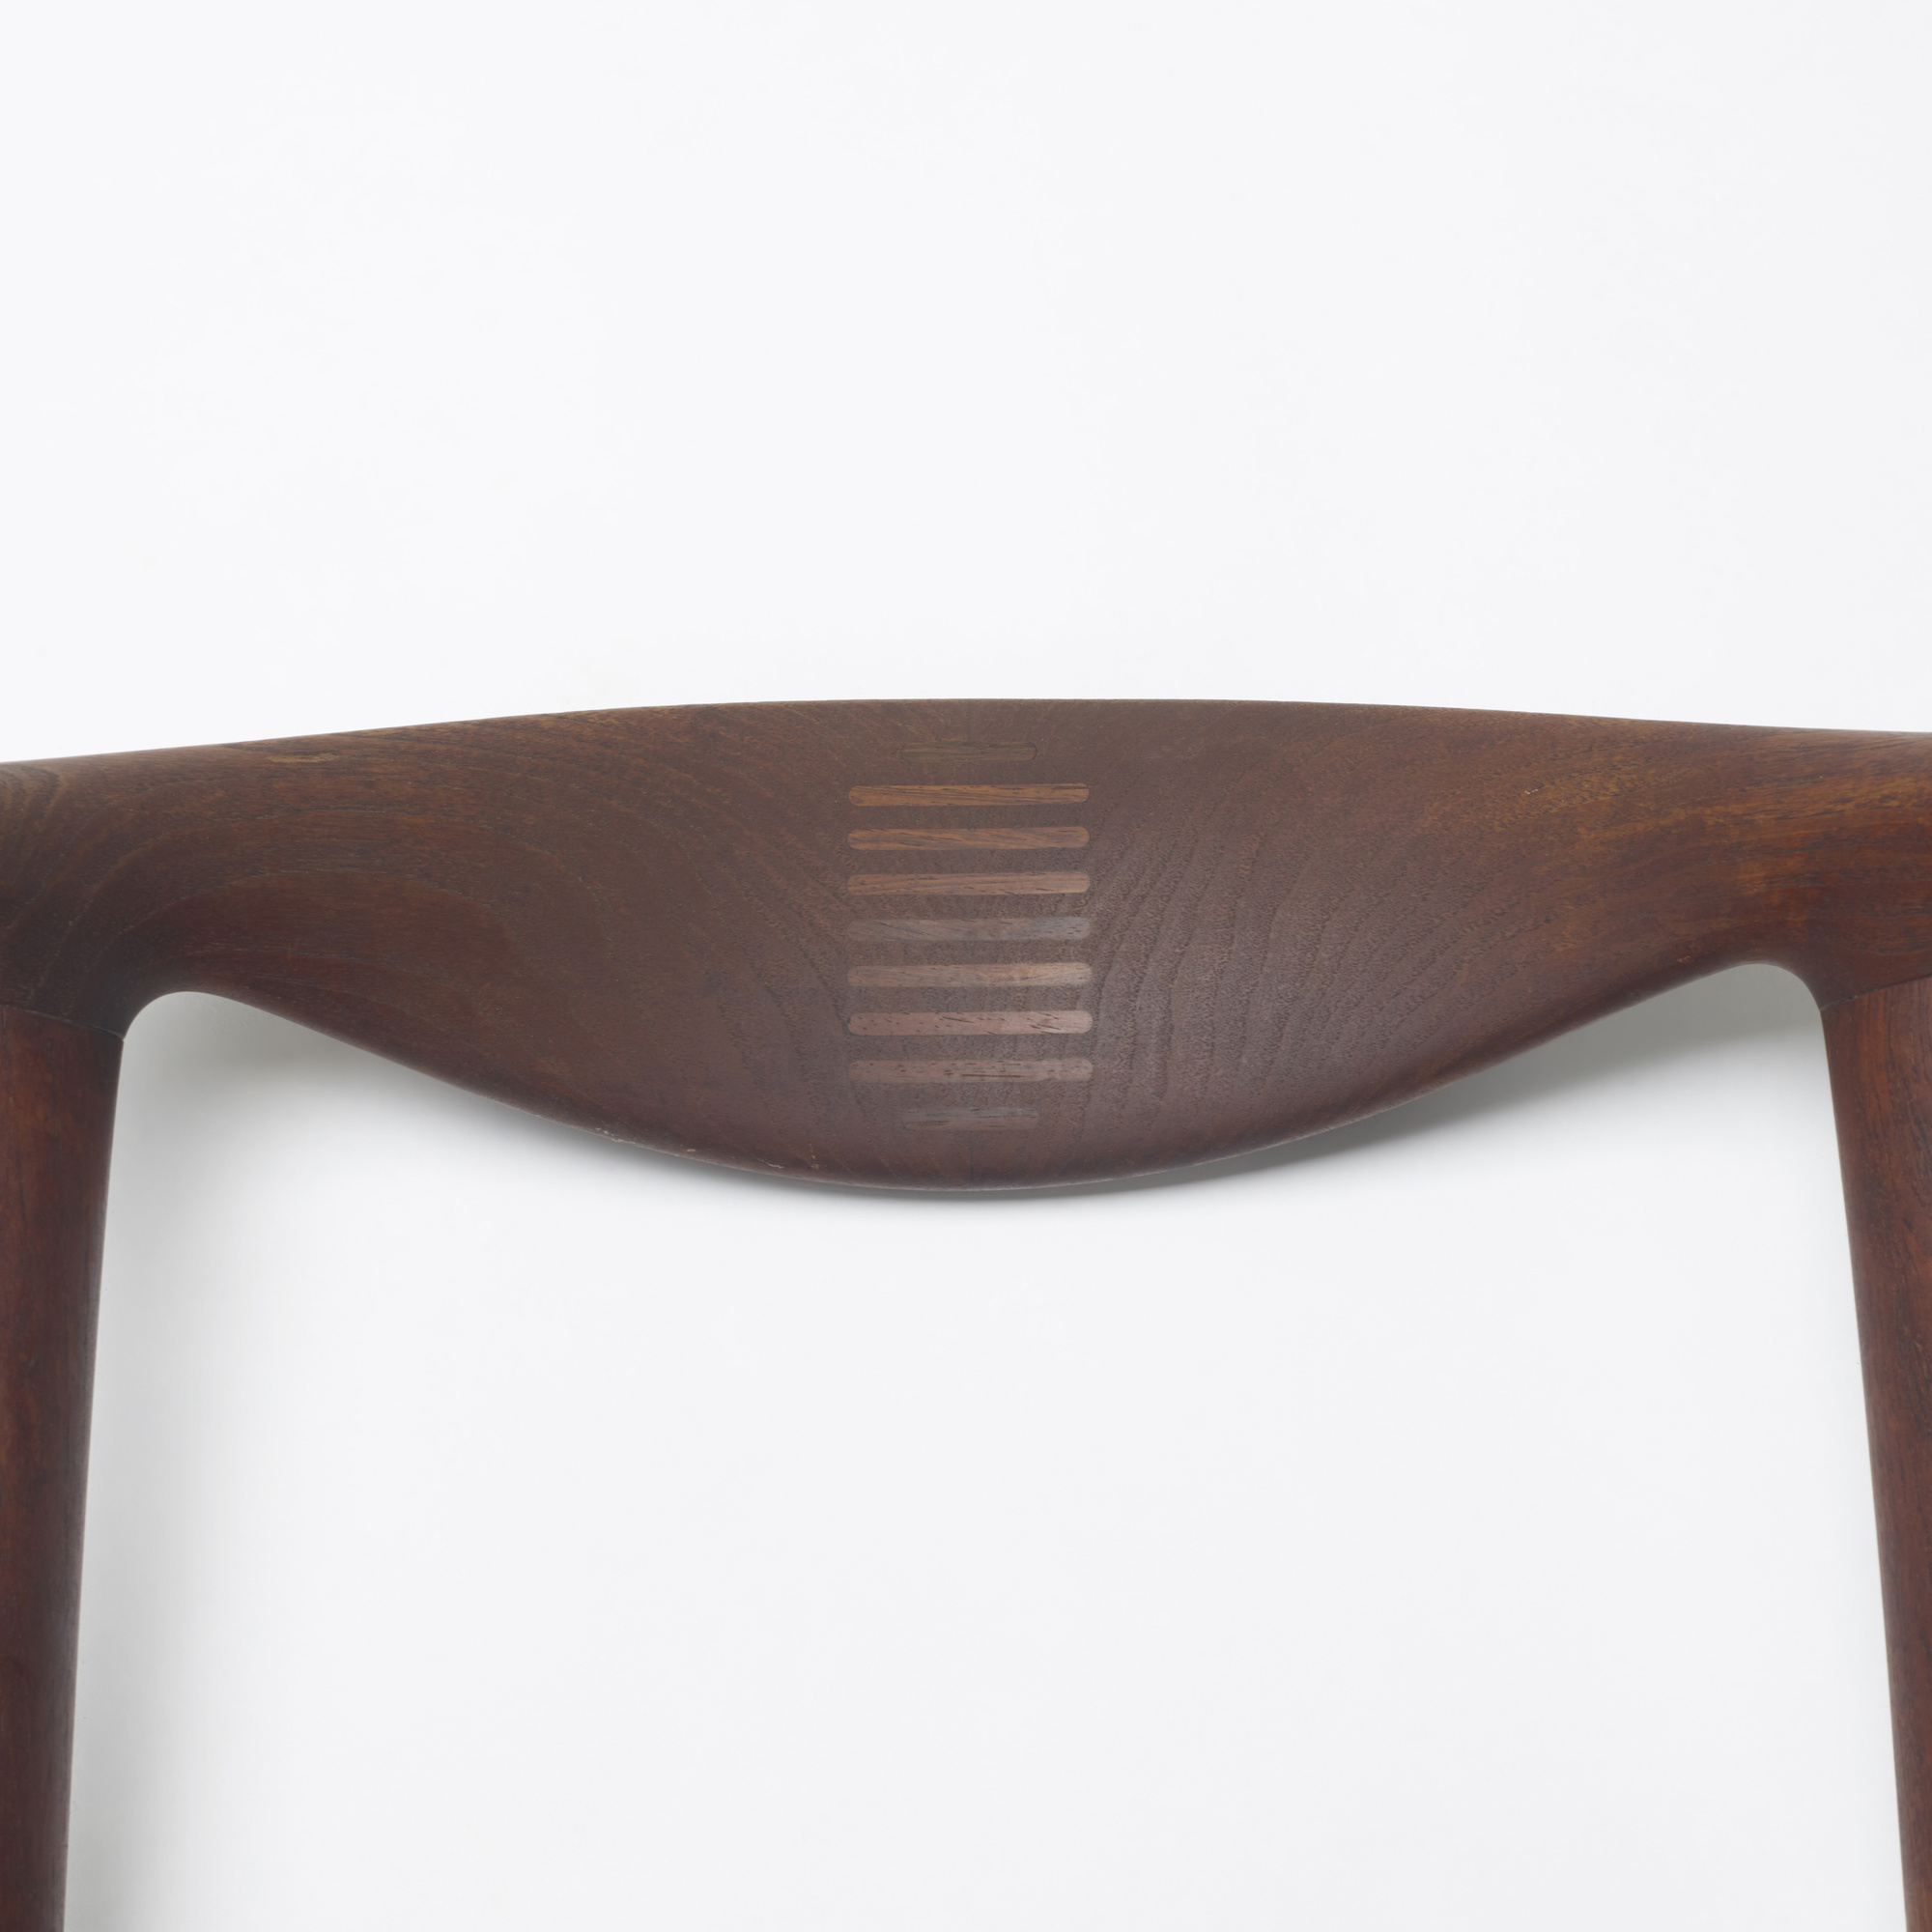 128: Hans J. Wegner / Cow Horn chairs, pair (2 of 3)